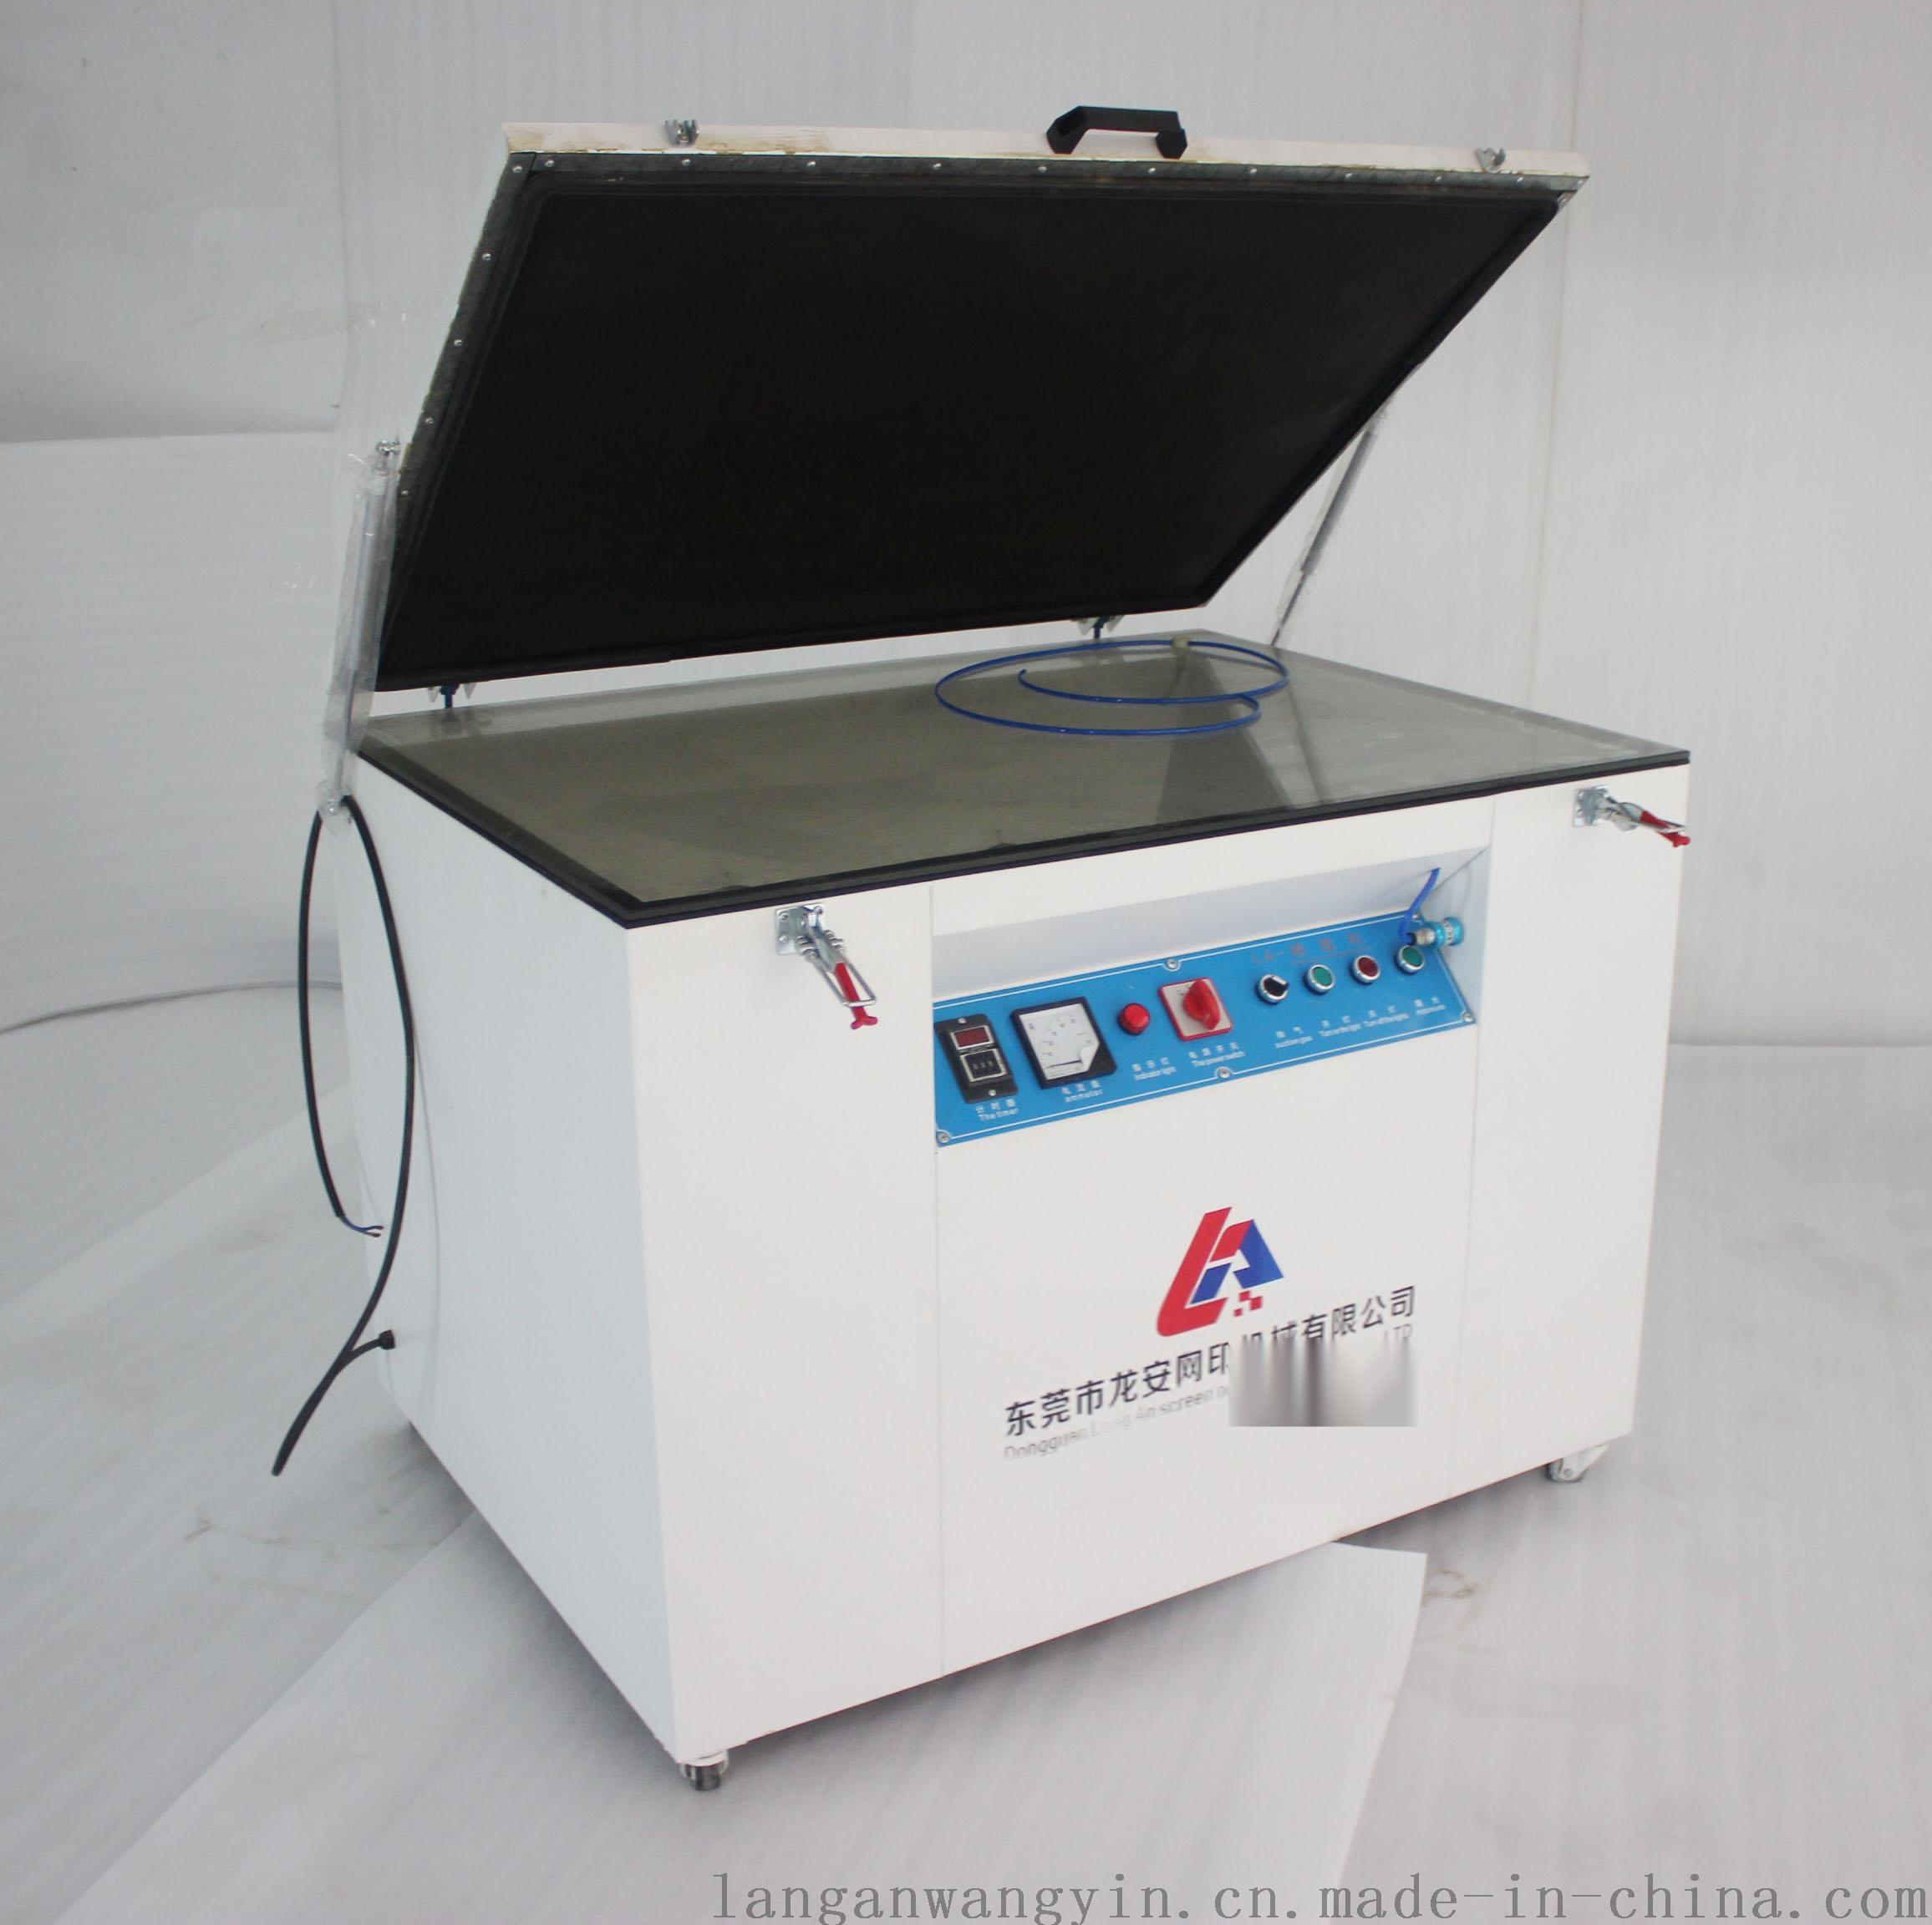 la9012晒版机东莞厂家碘镓灯晒网机密封件算了图片